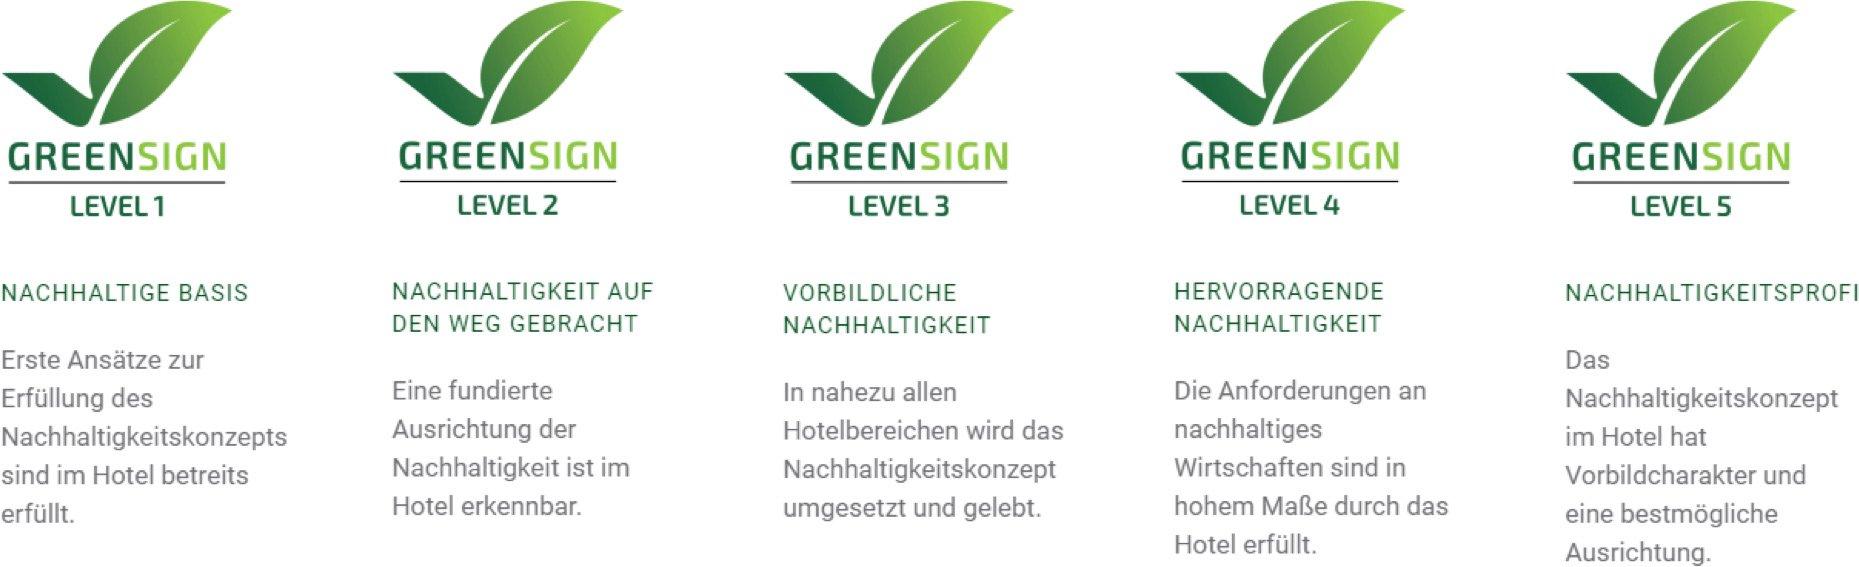 Greensignlevel im Überblick